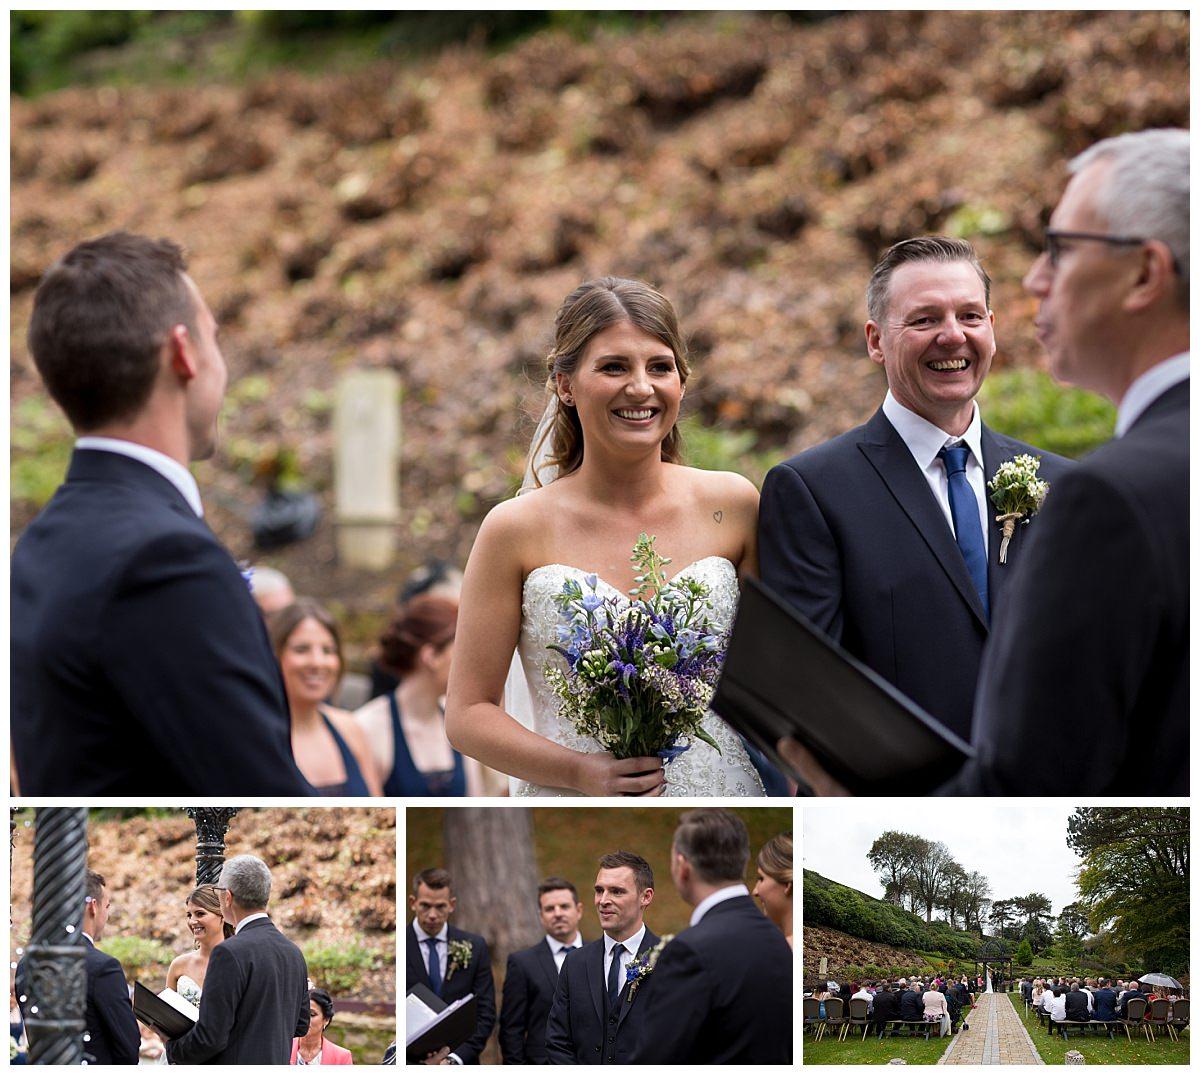 The Raithwaite Estate Weddings